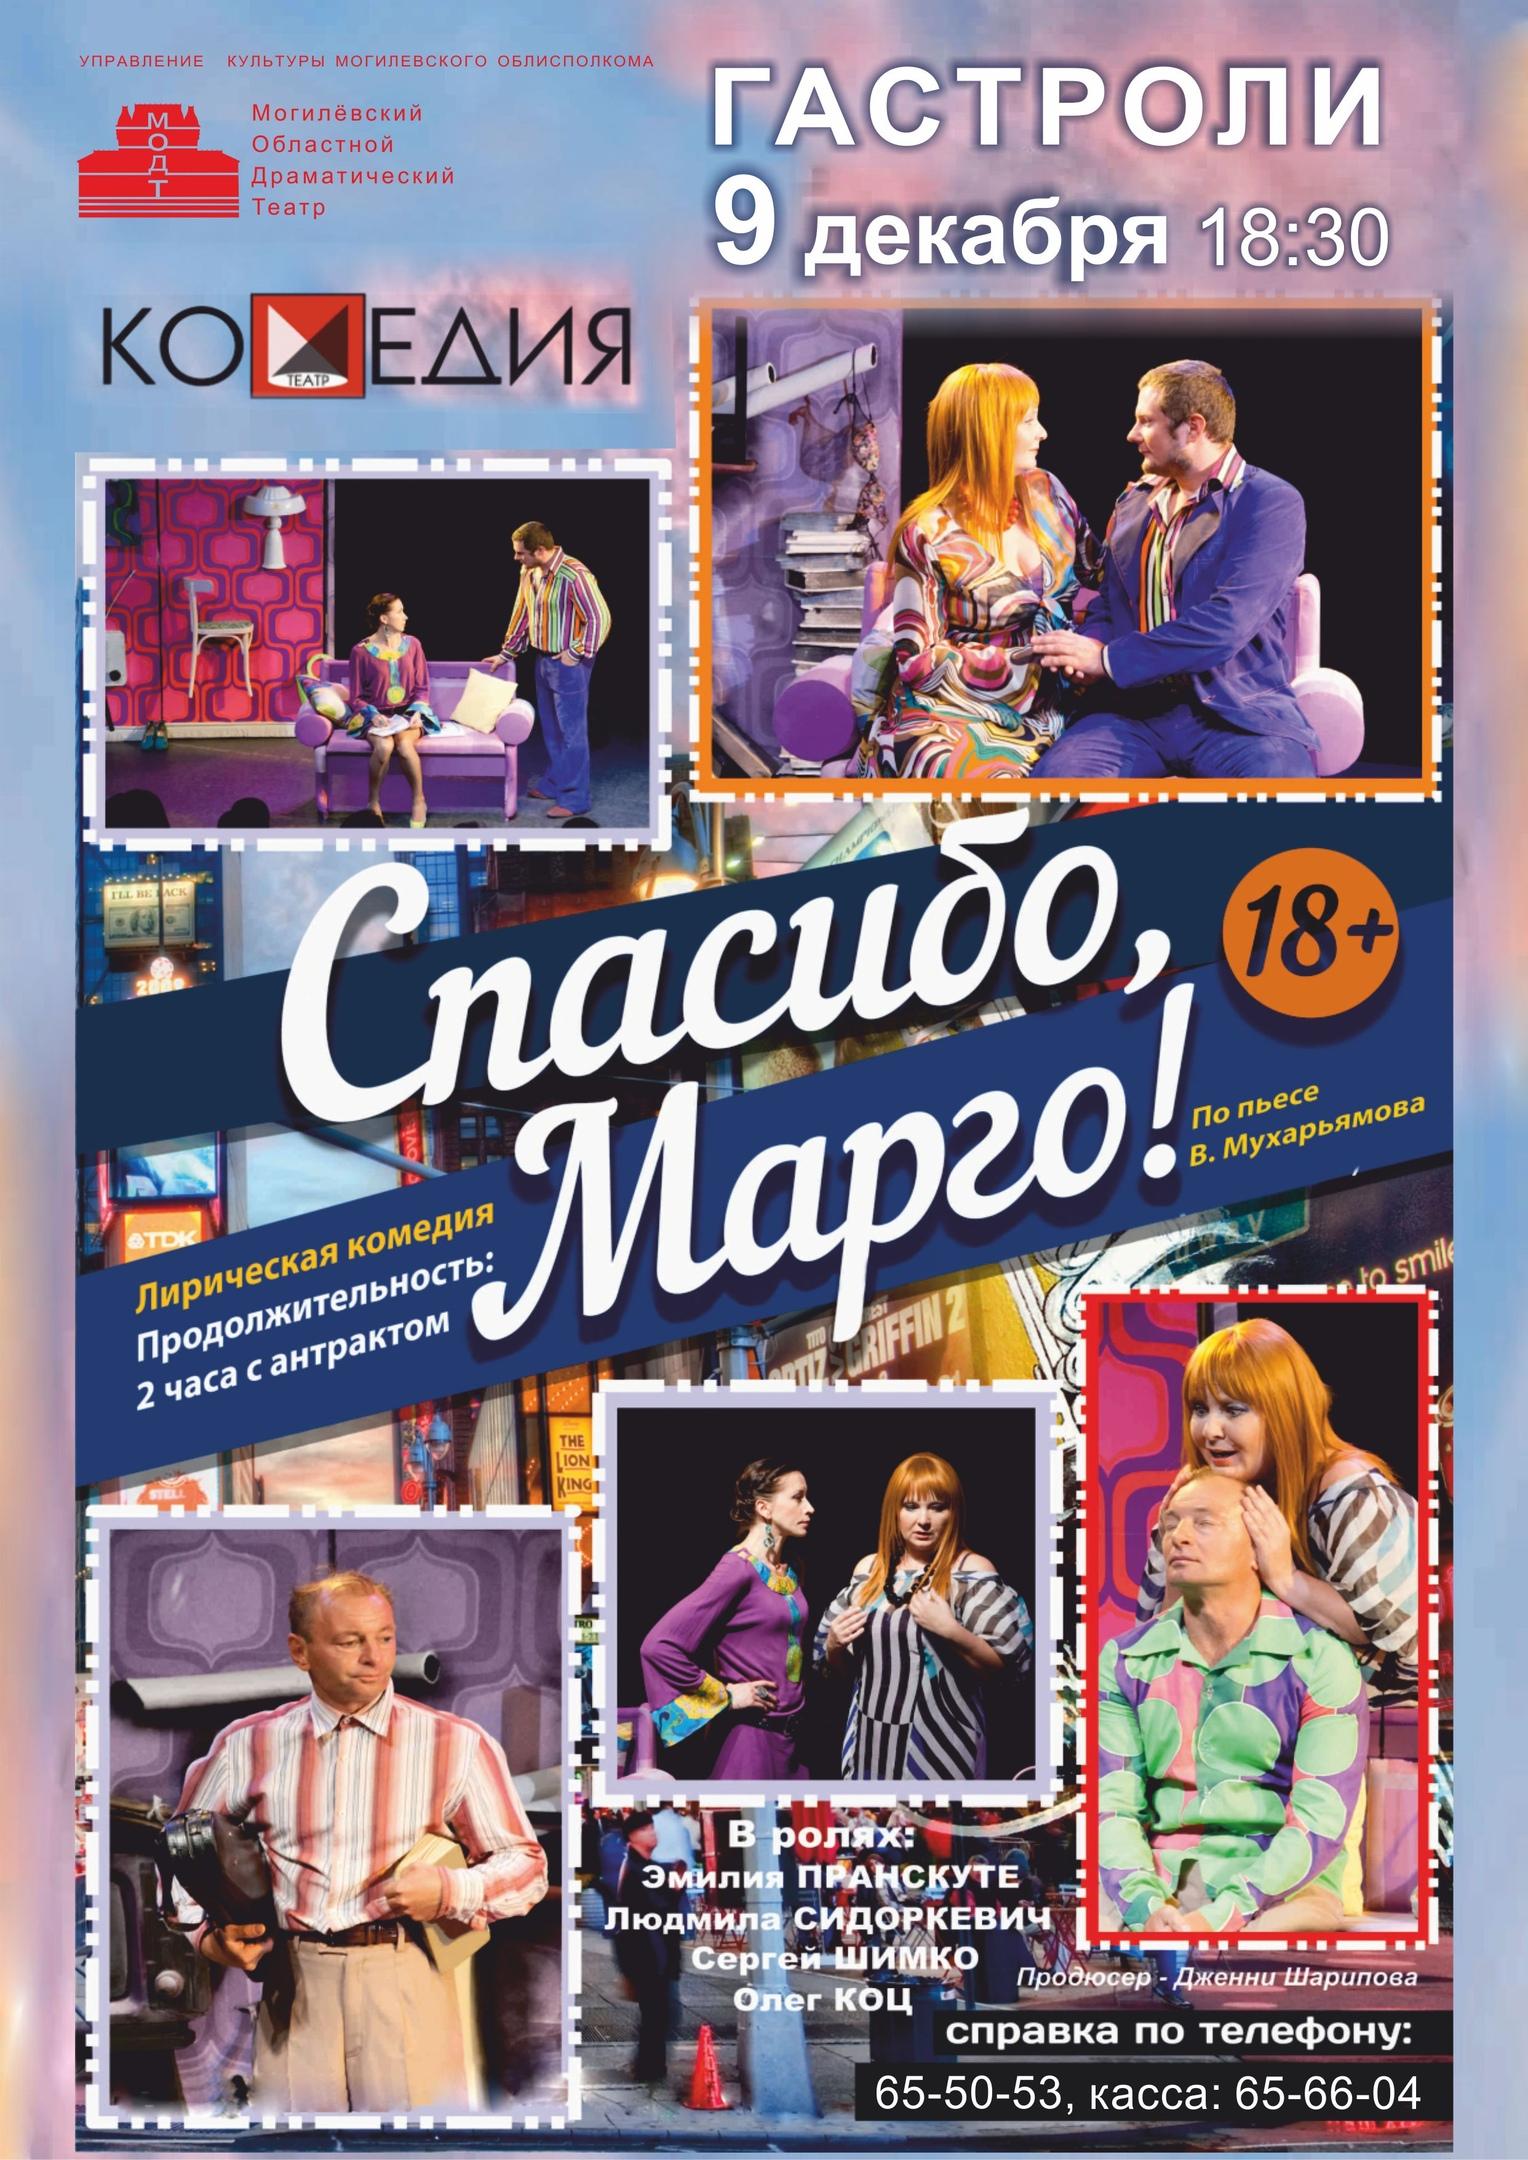 """Спасибо, Марго!"". Театр ""Комедия"", г. Минск"